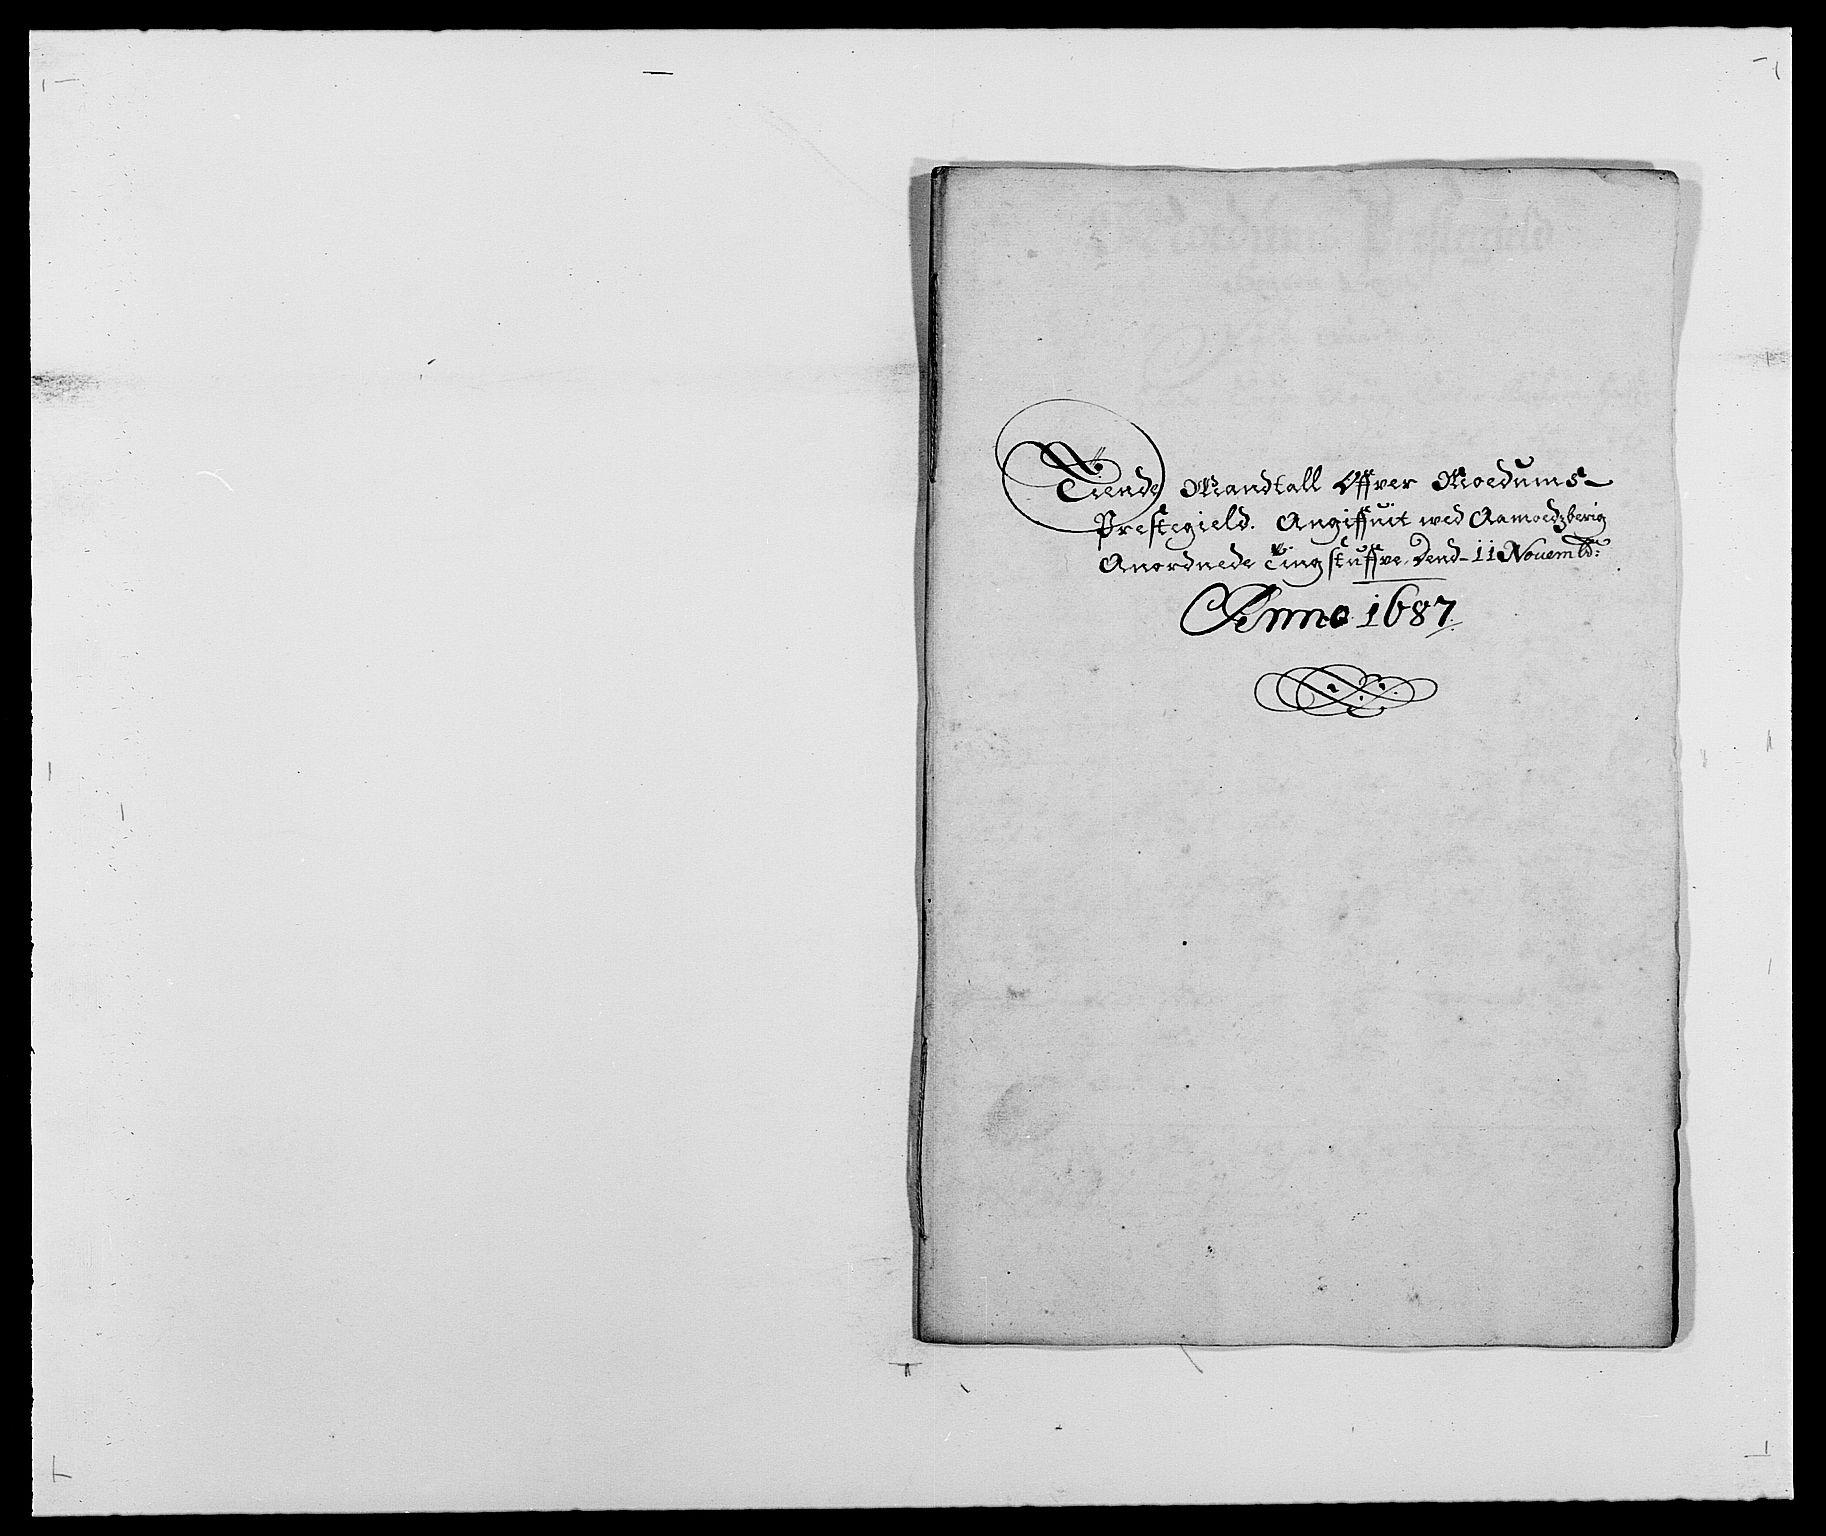 RA, Rentekammeret inntil 1814, Reviderte regnskaper, Fogderegnskap, R25/L1679: Fogderegnskap Buskerud, 1687-1688, s. 44